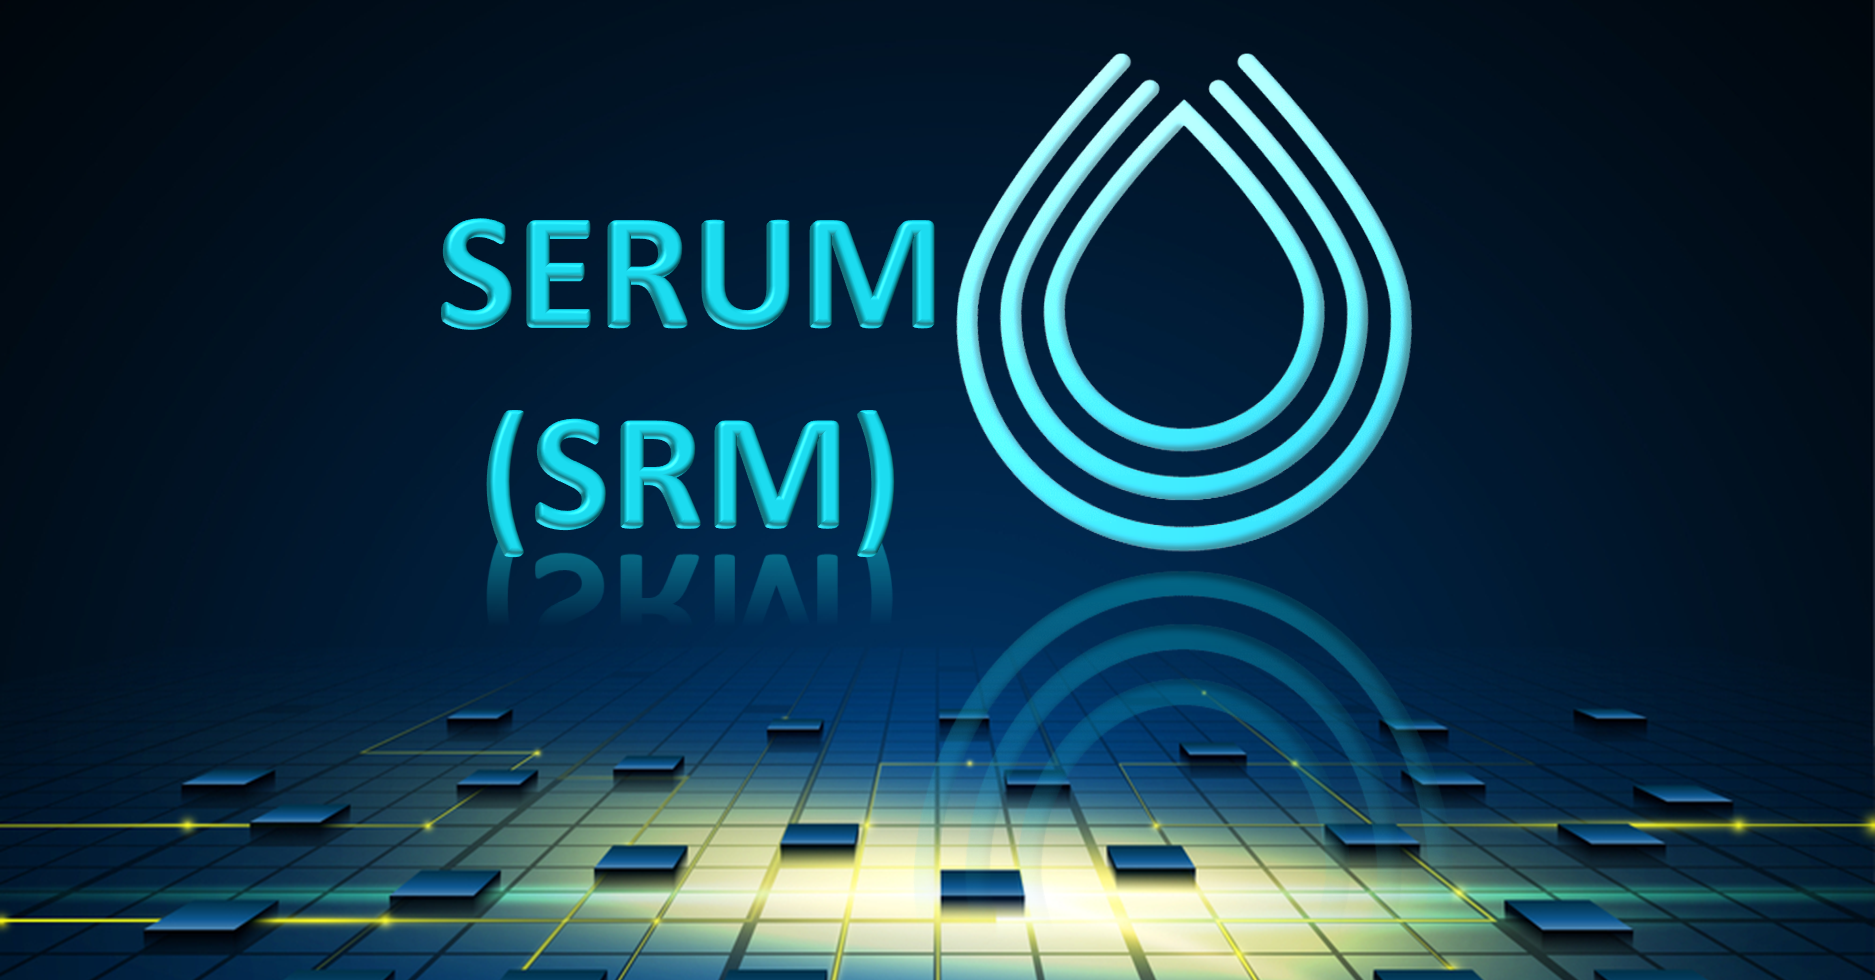 serum srm